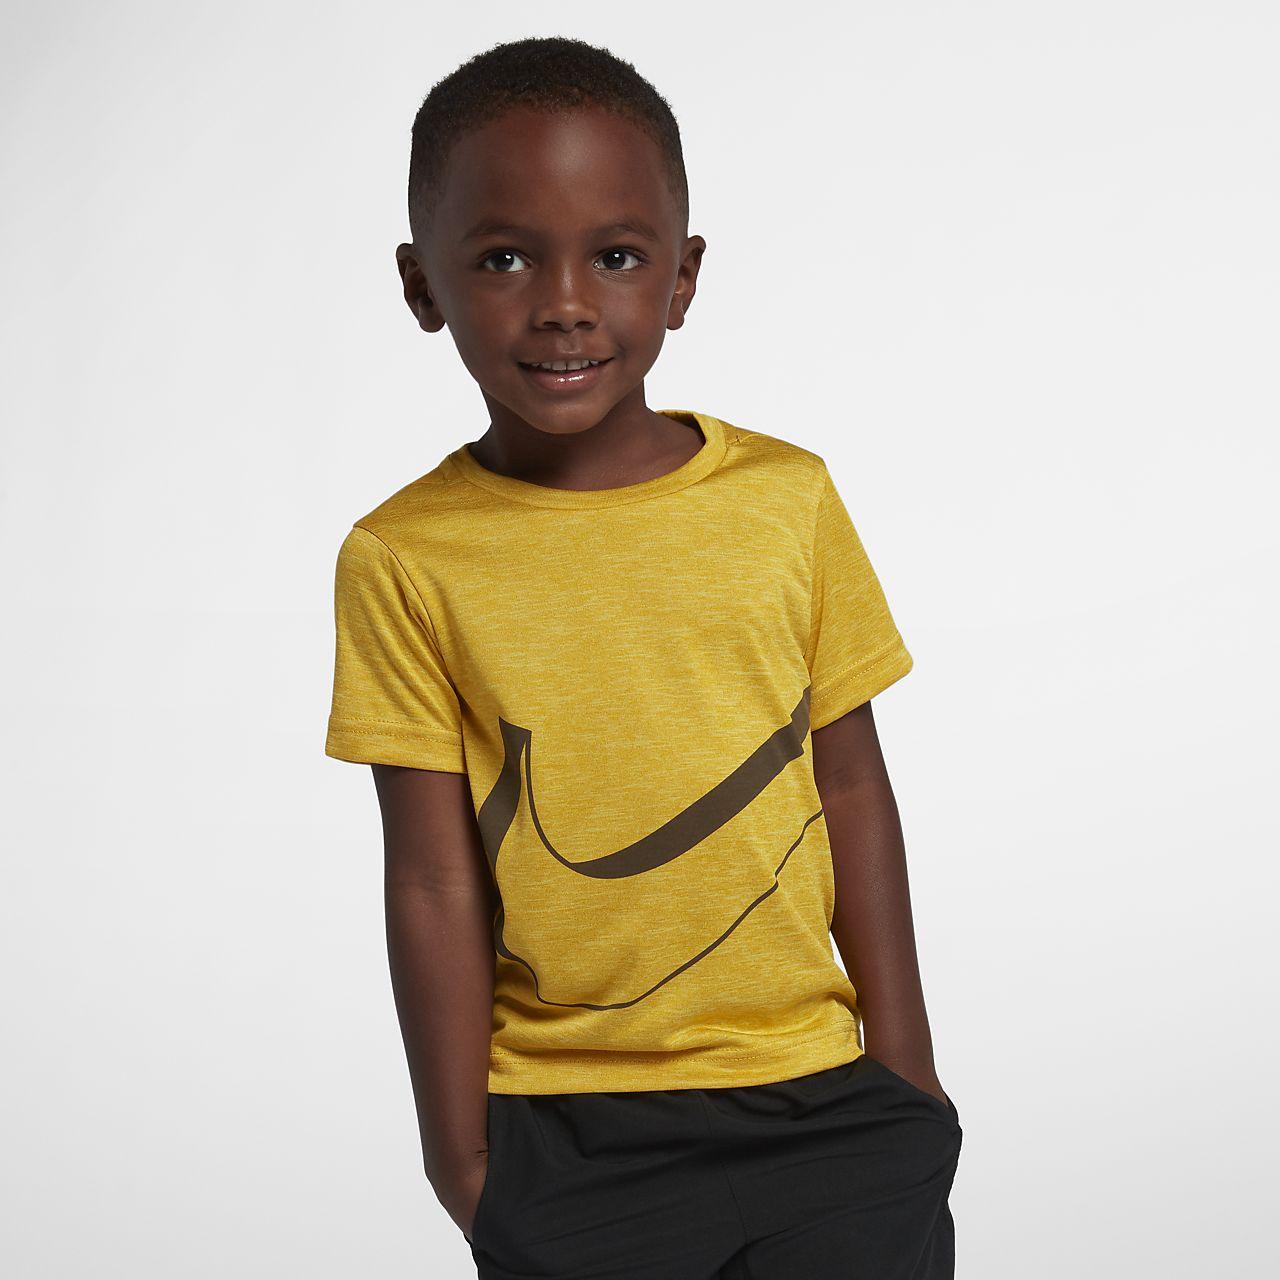 Nike Breathe Camiseta - Niño/a pequeño/a